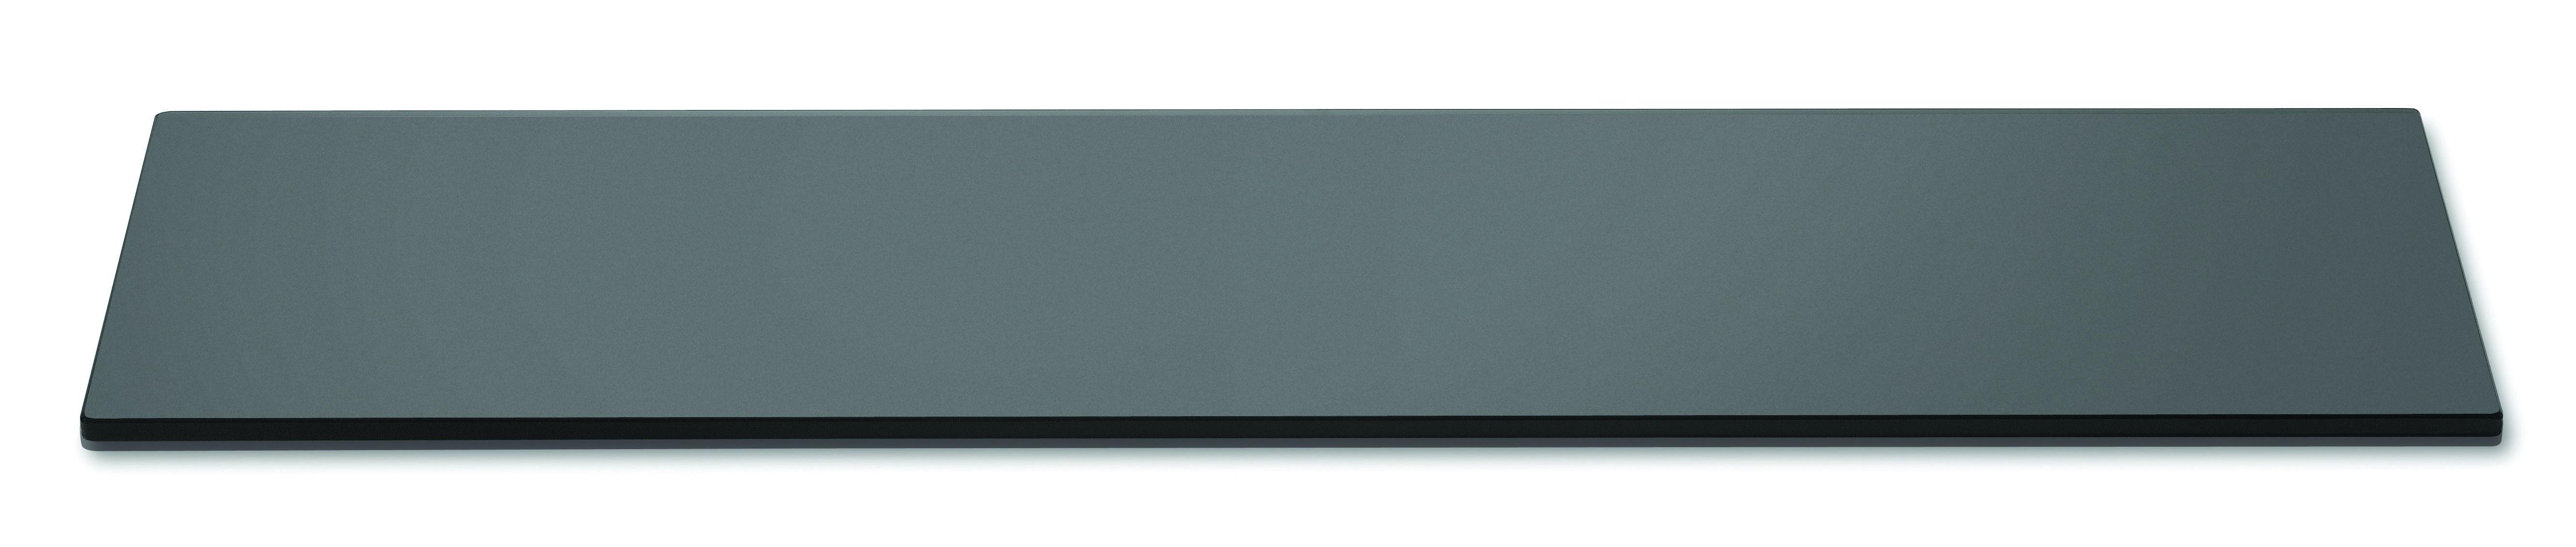 "Rosseto SG015 Narrow Rectangular Black Acrylic Surface 33.5"" x 7.75"""